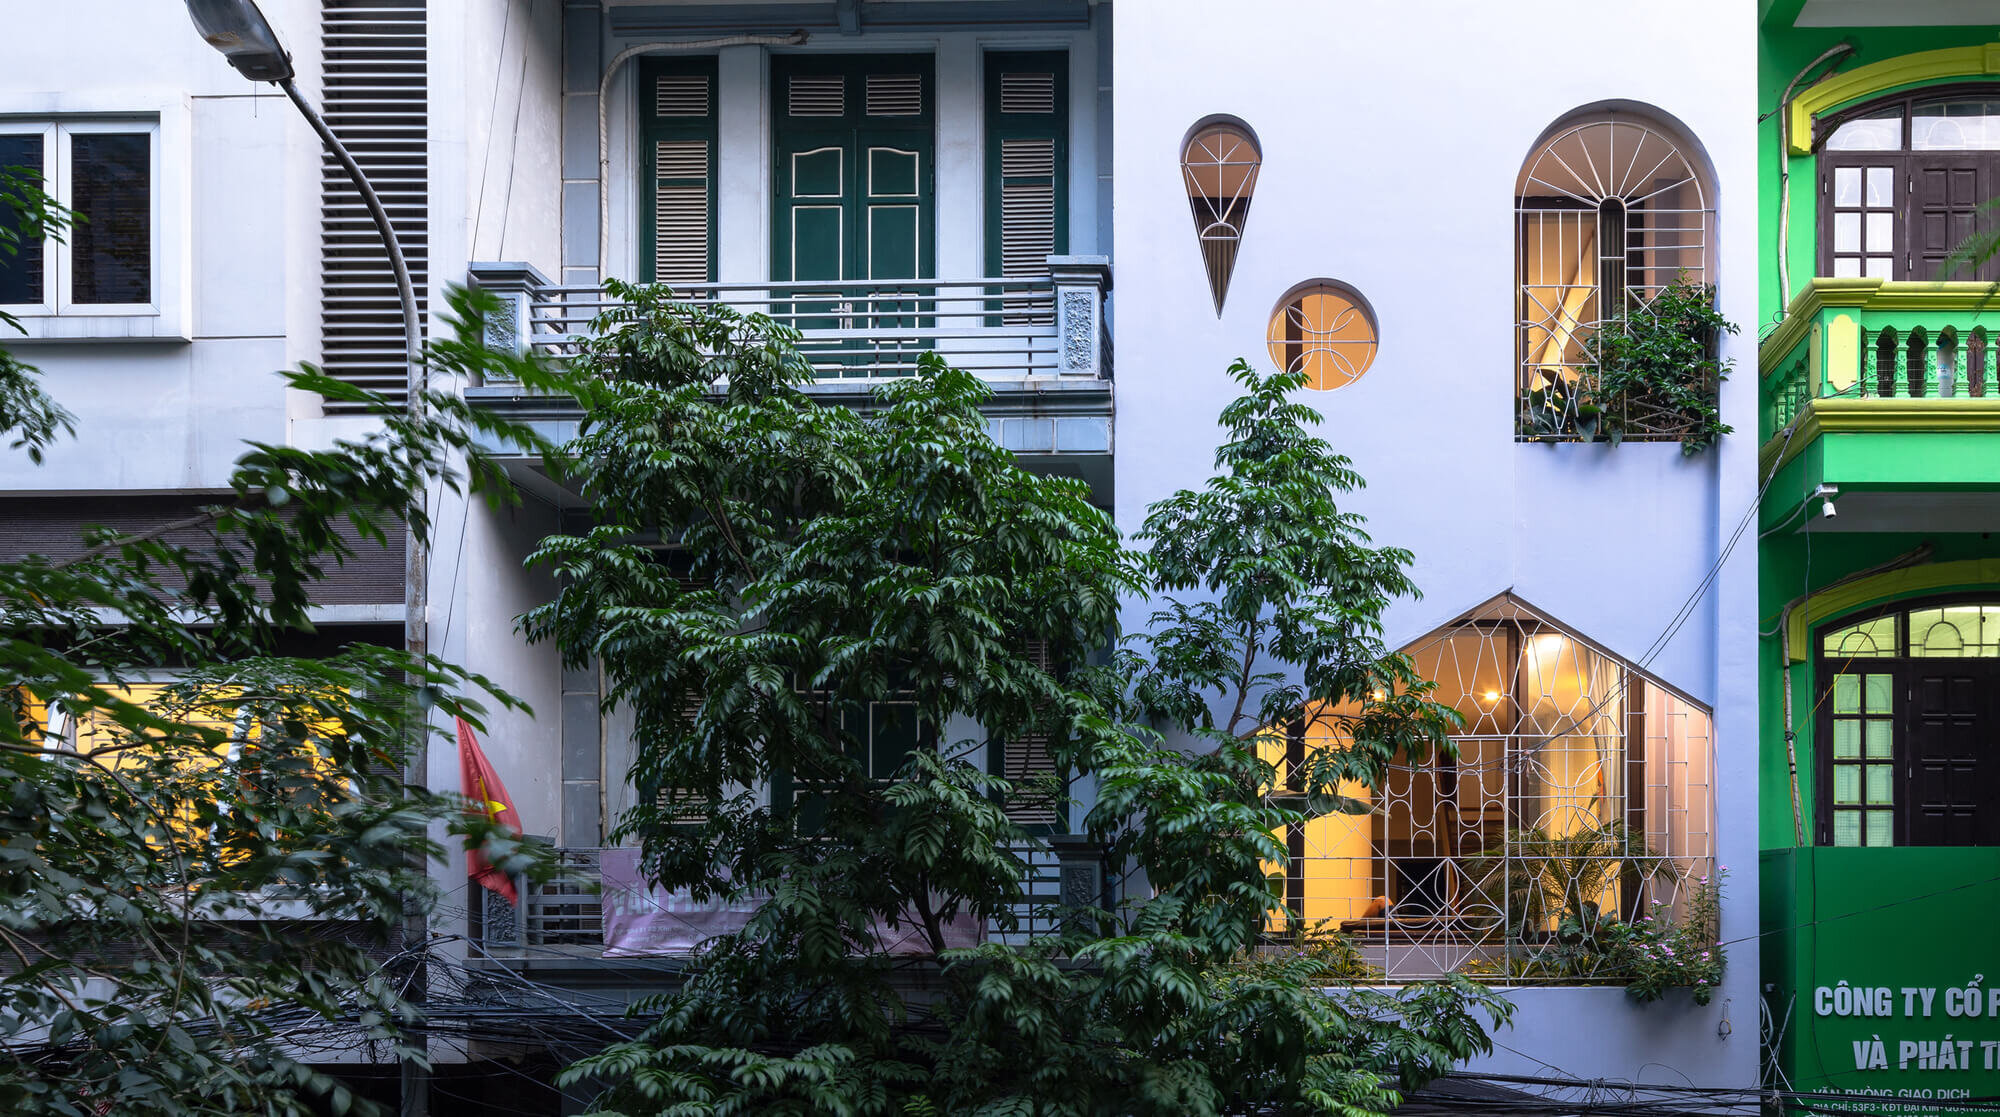 Đại-Kim-house-Aline-Architect-Vietnam-5